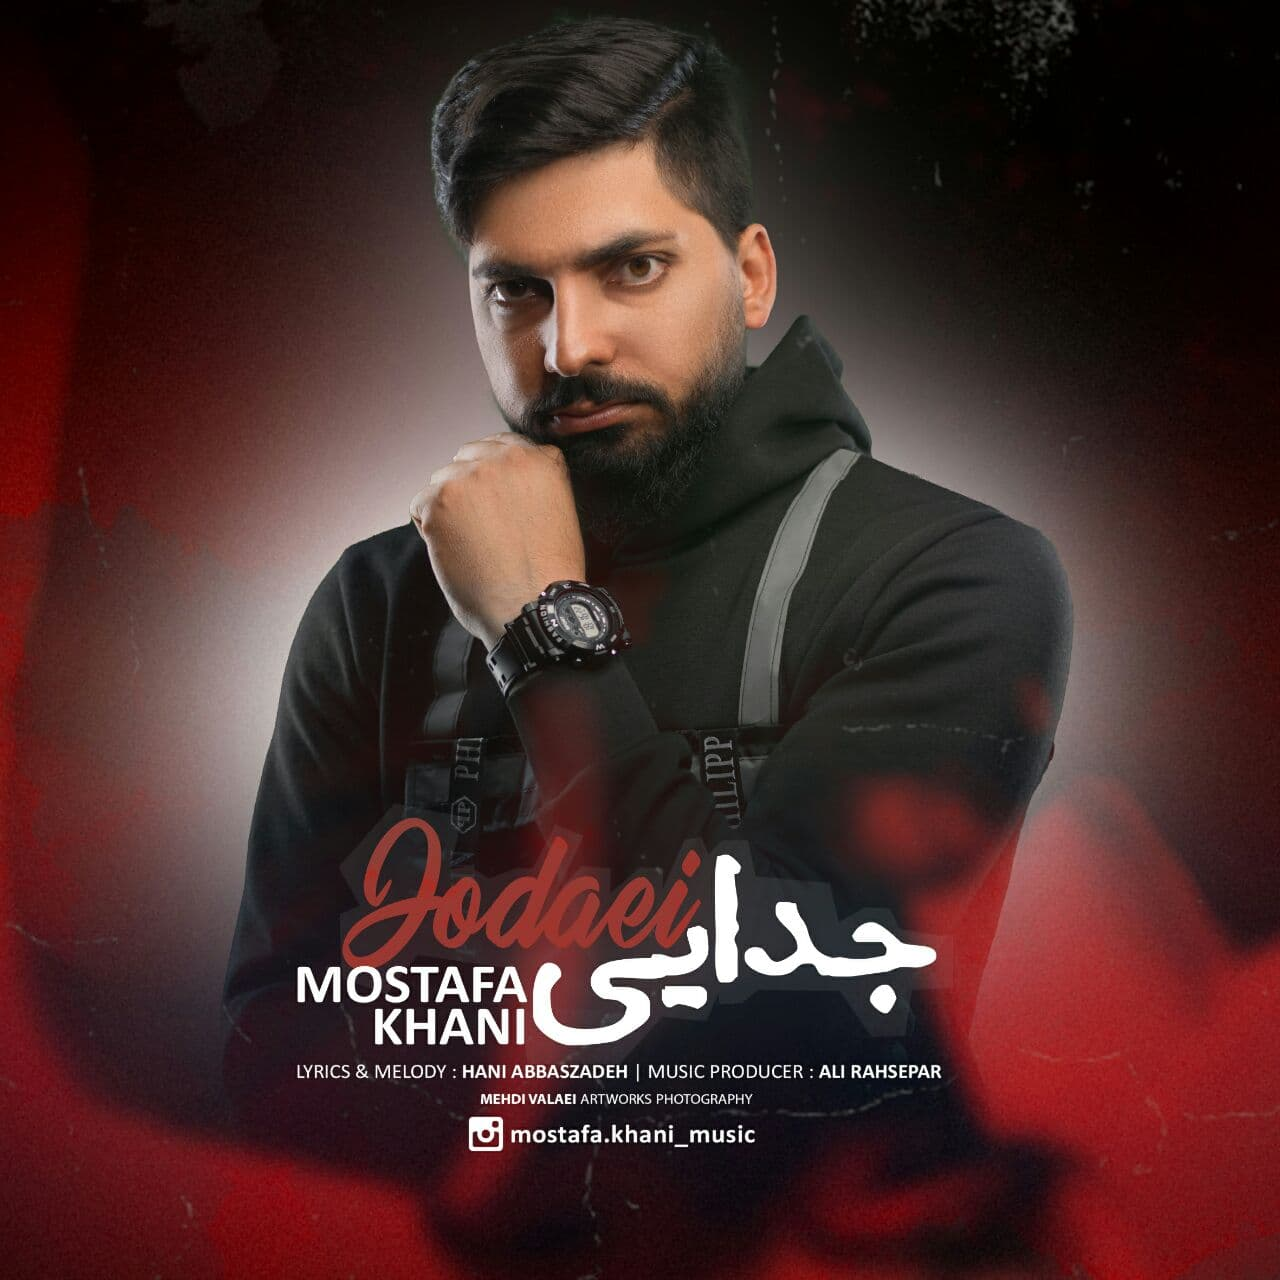 Mostafa Khani – Jodaei